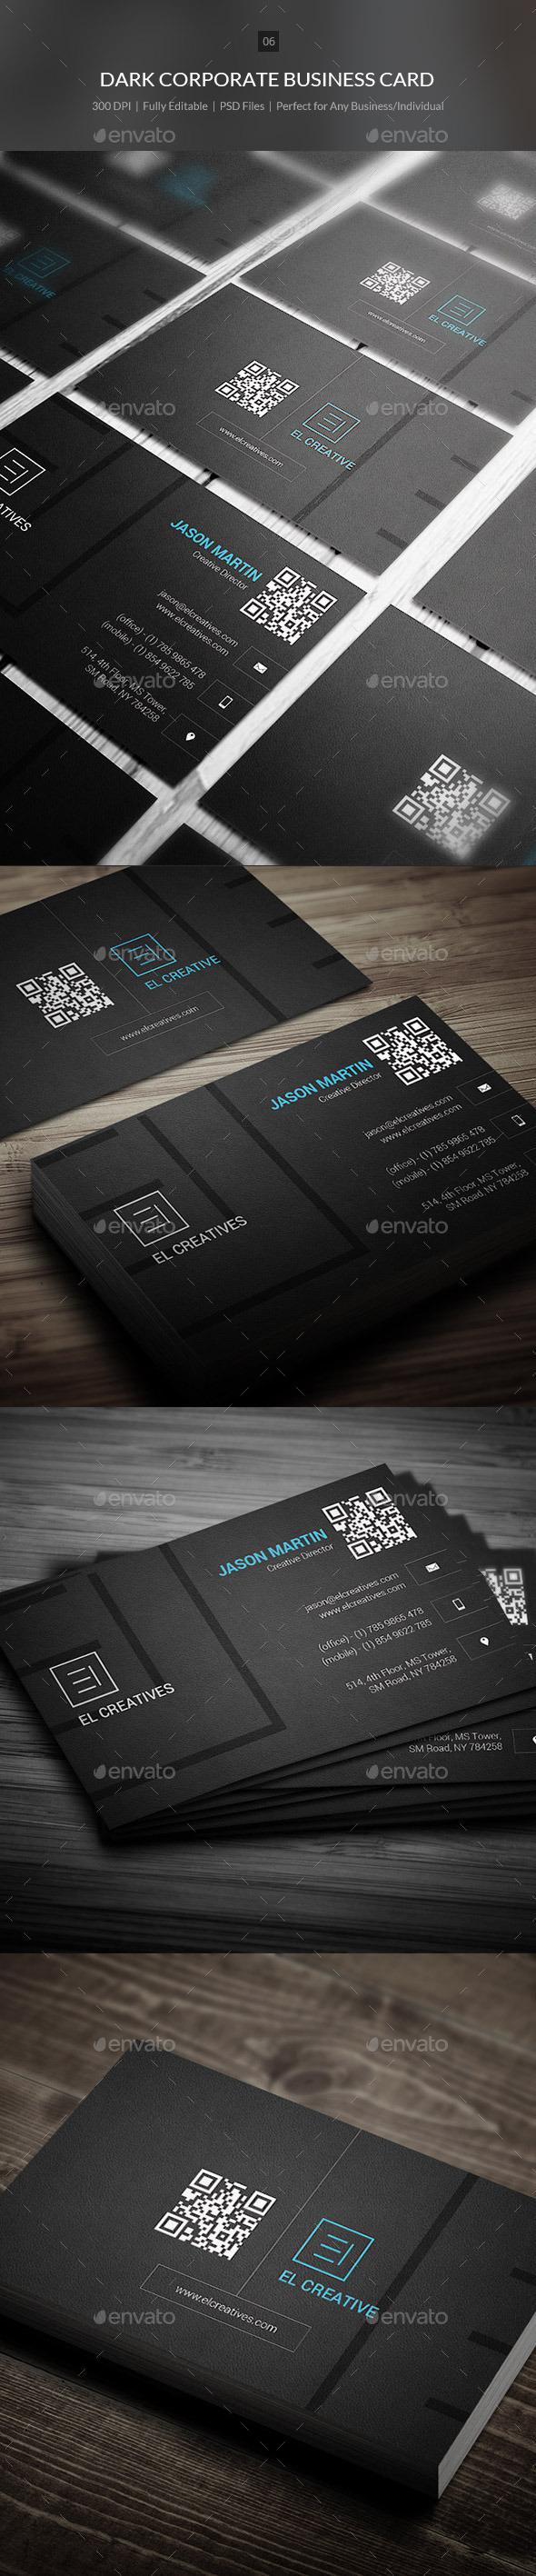 GraphicRiver Dark Corporate Business Card 06 9986288